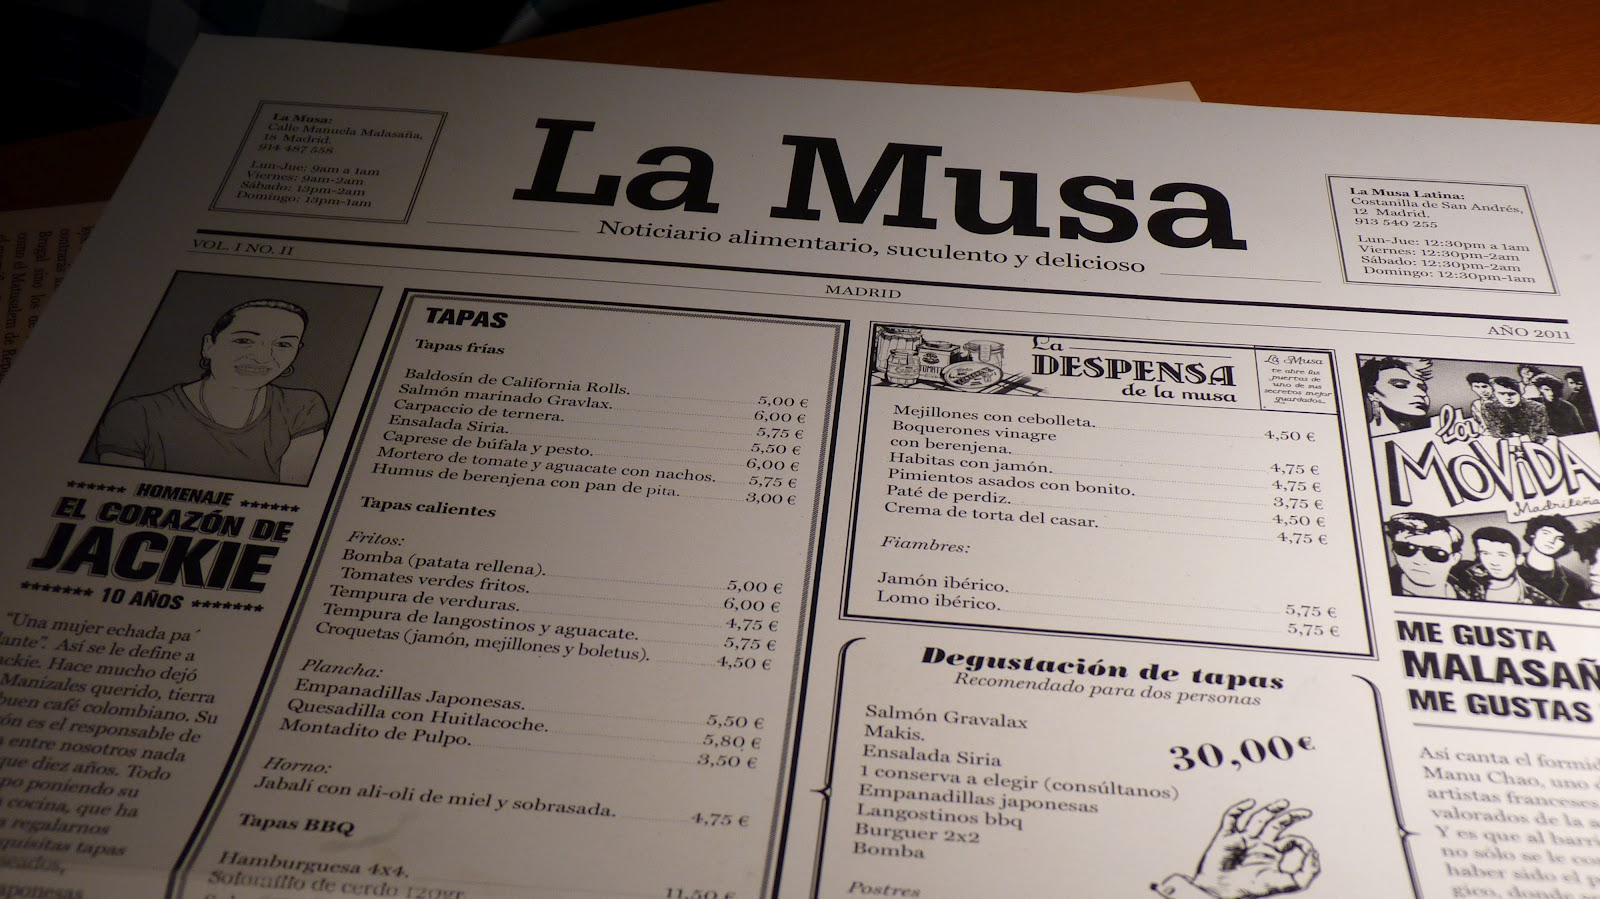 De rinconcitos por madrid beautiful things - La musa latina madrid ...